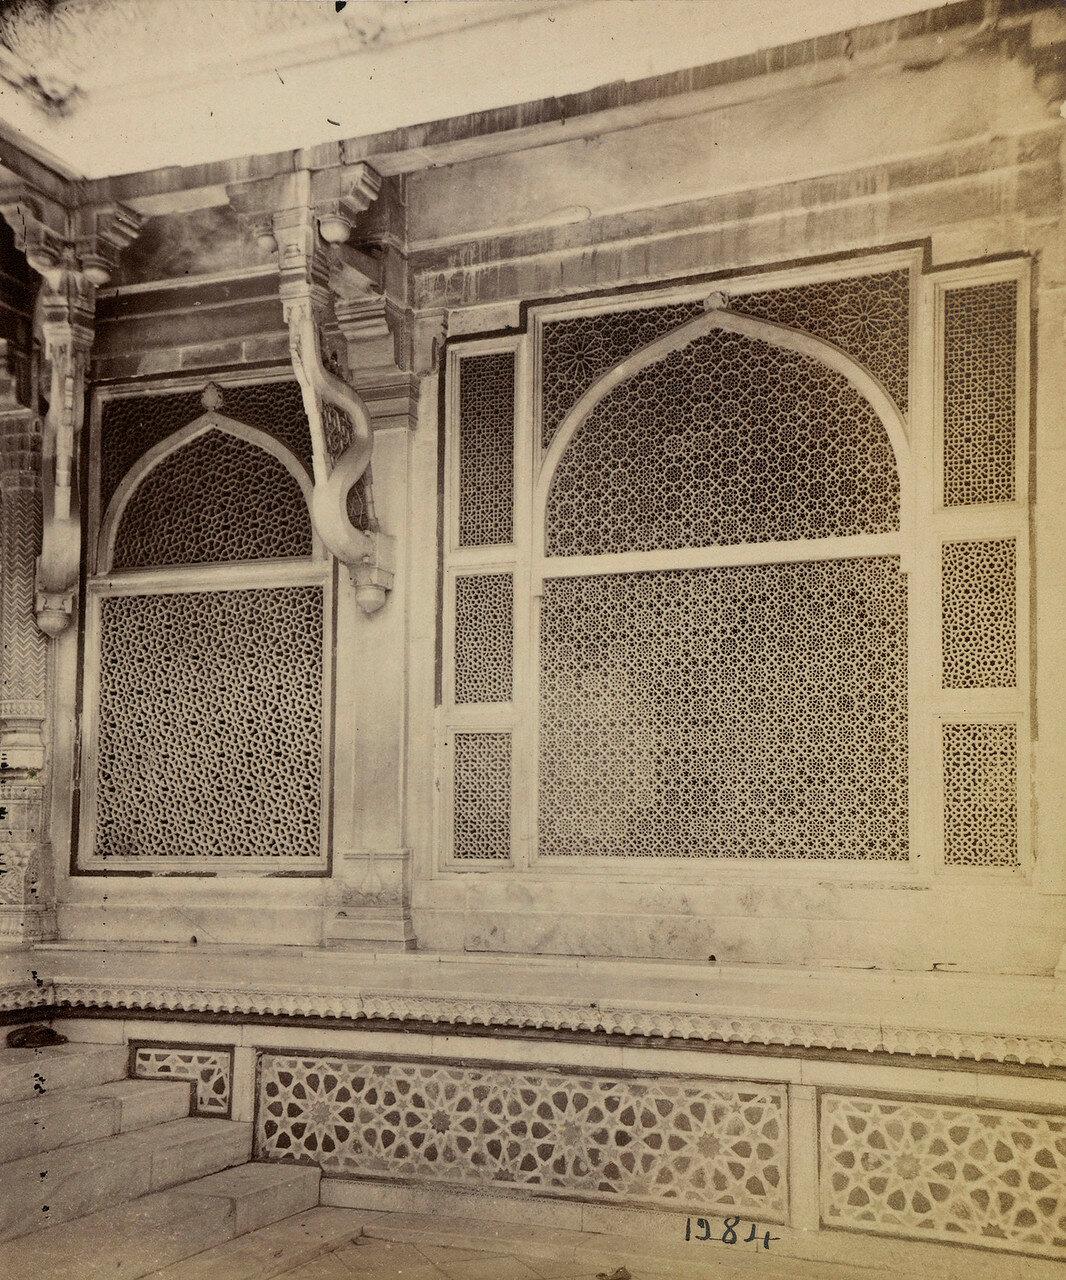 68. Мраморные перегородки в мавзолее шейха Салима Чишти